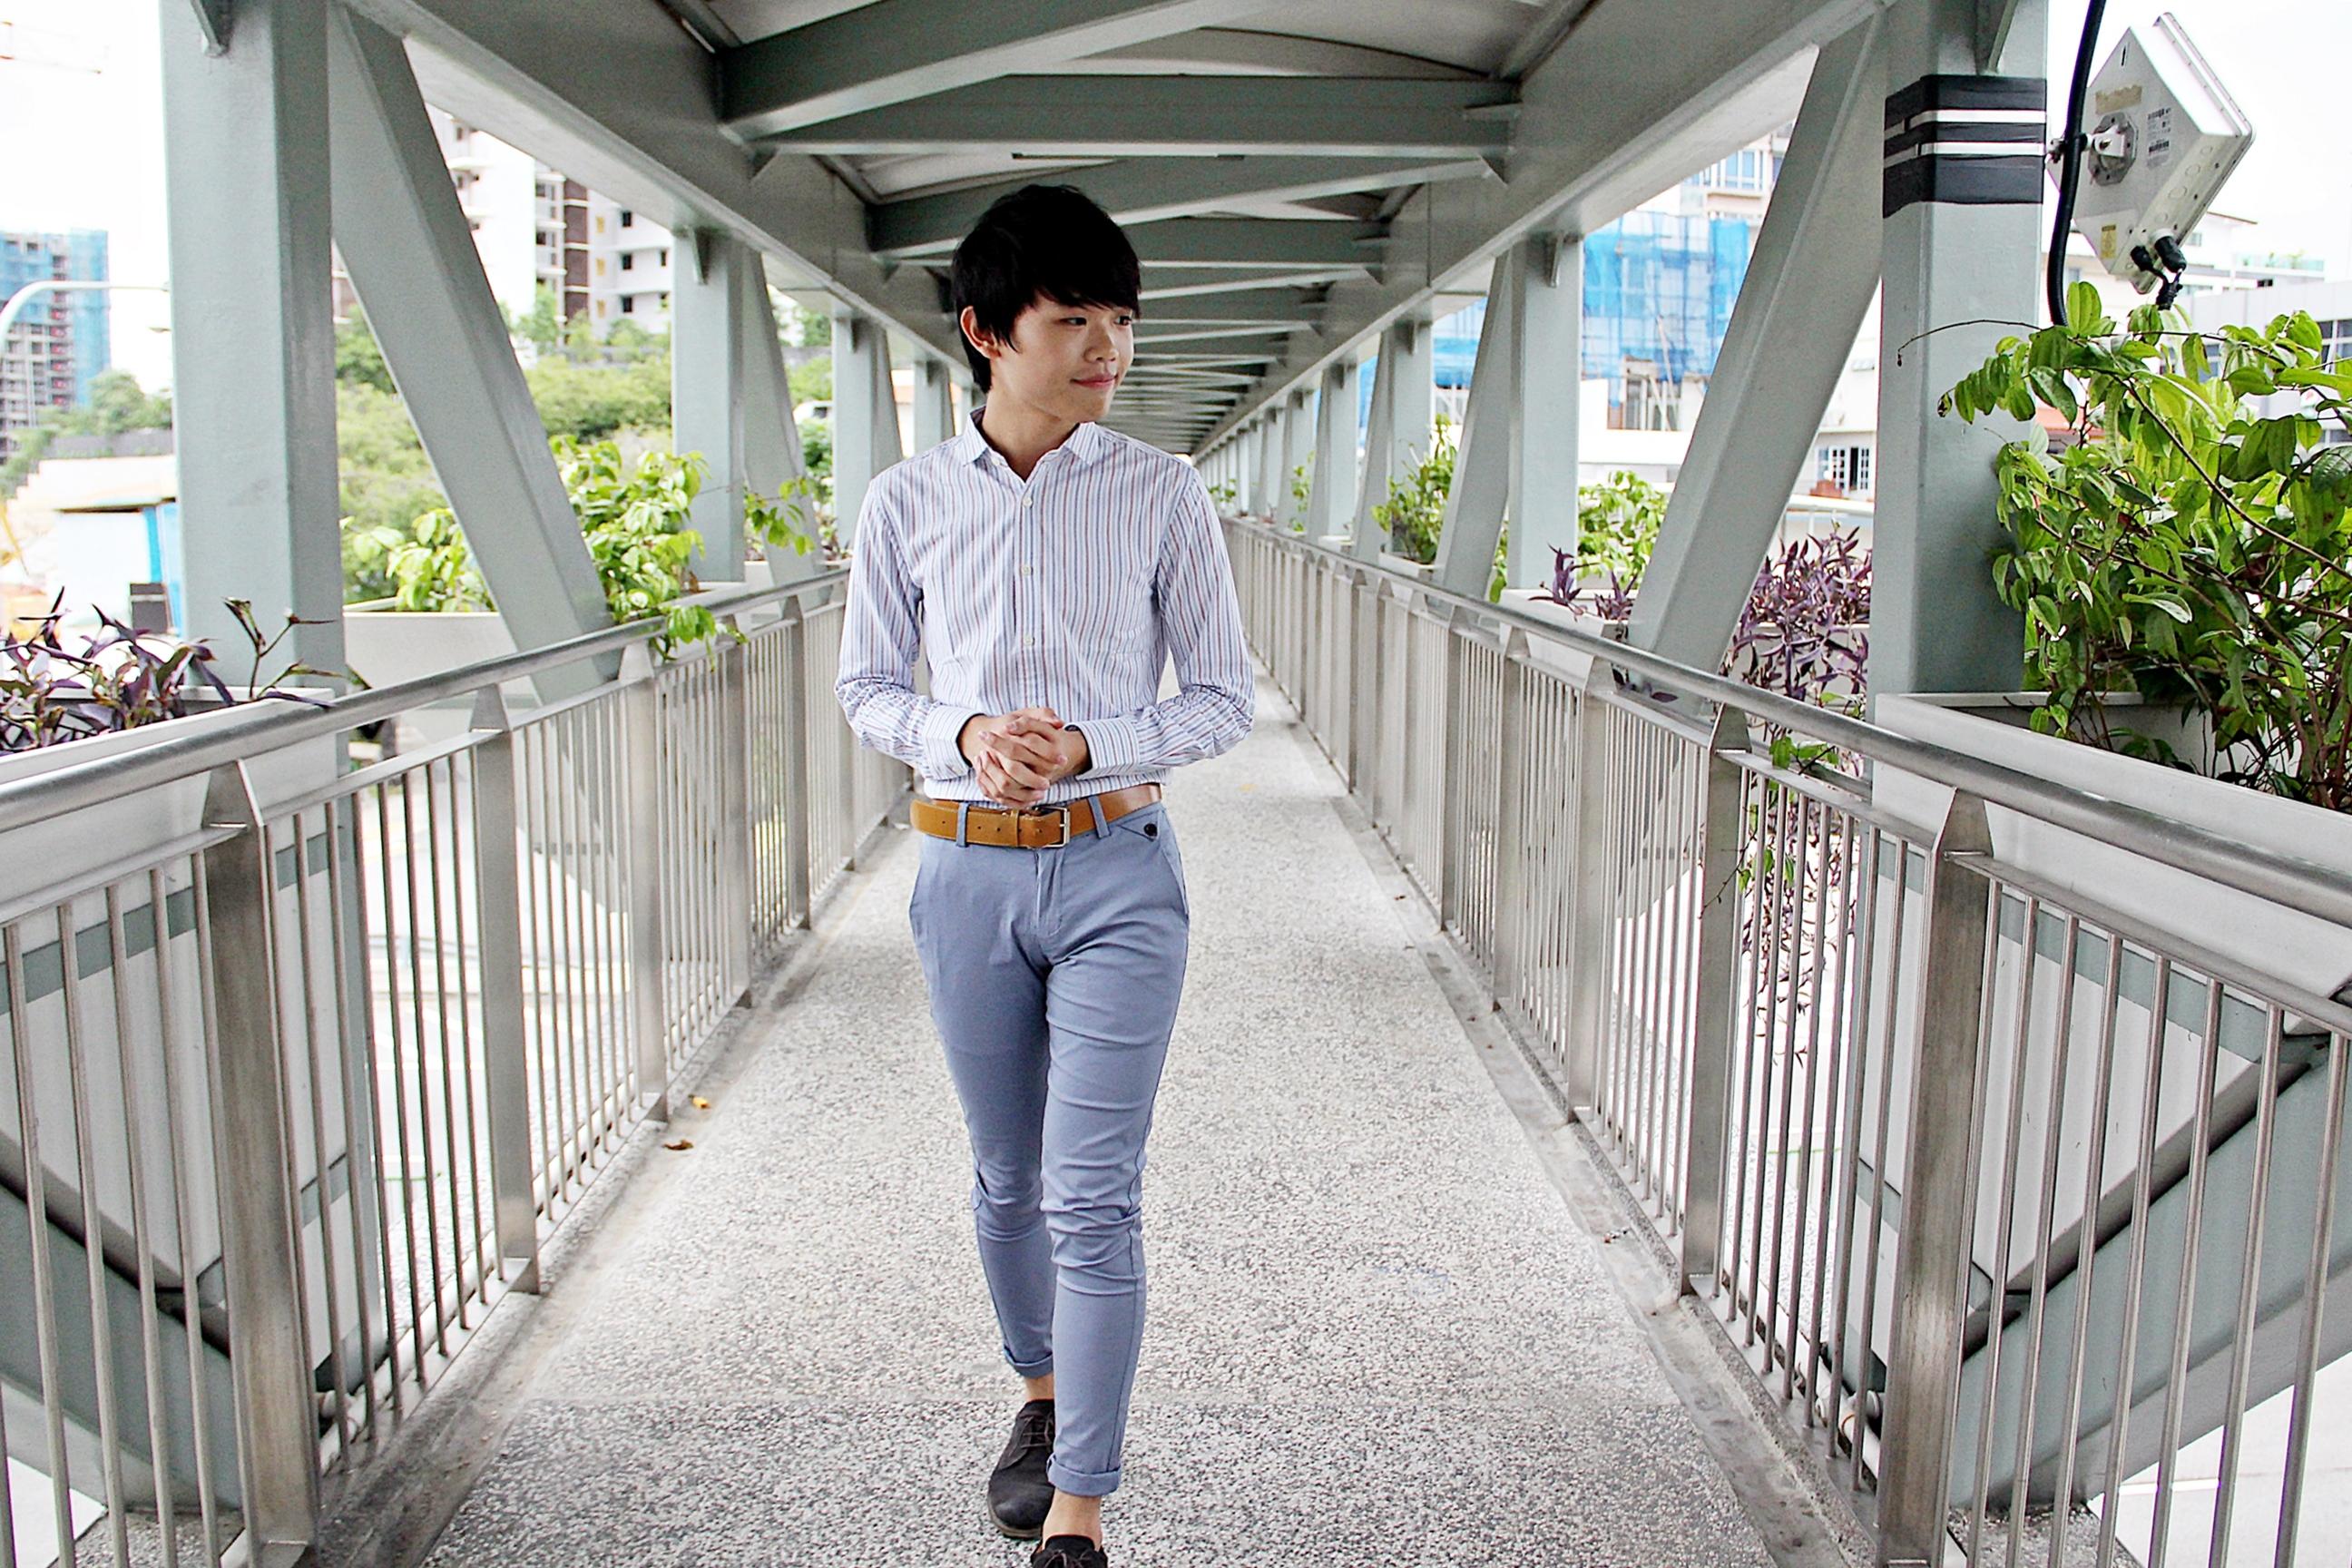 White Shirt and Blue pants